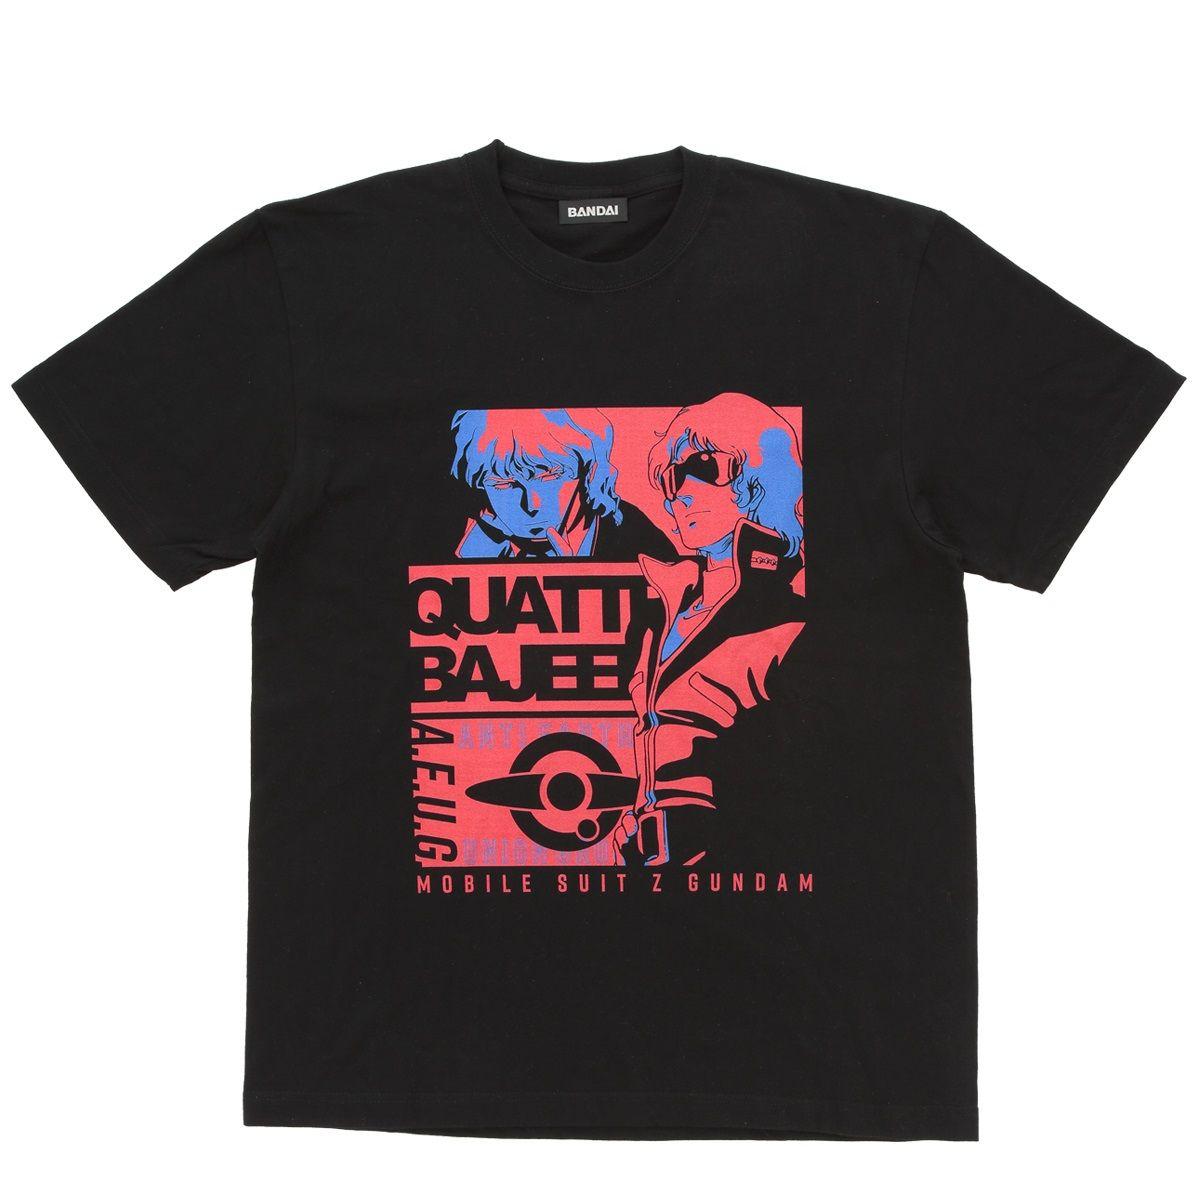 Mobile Suit Zeta Gundam Quattro Bajeena Tricolor-themed T-shirt